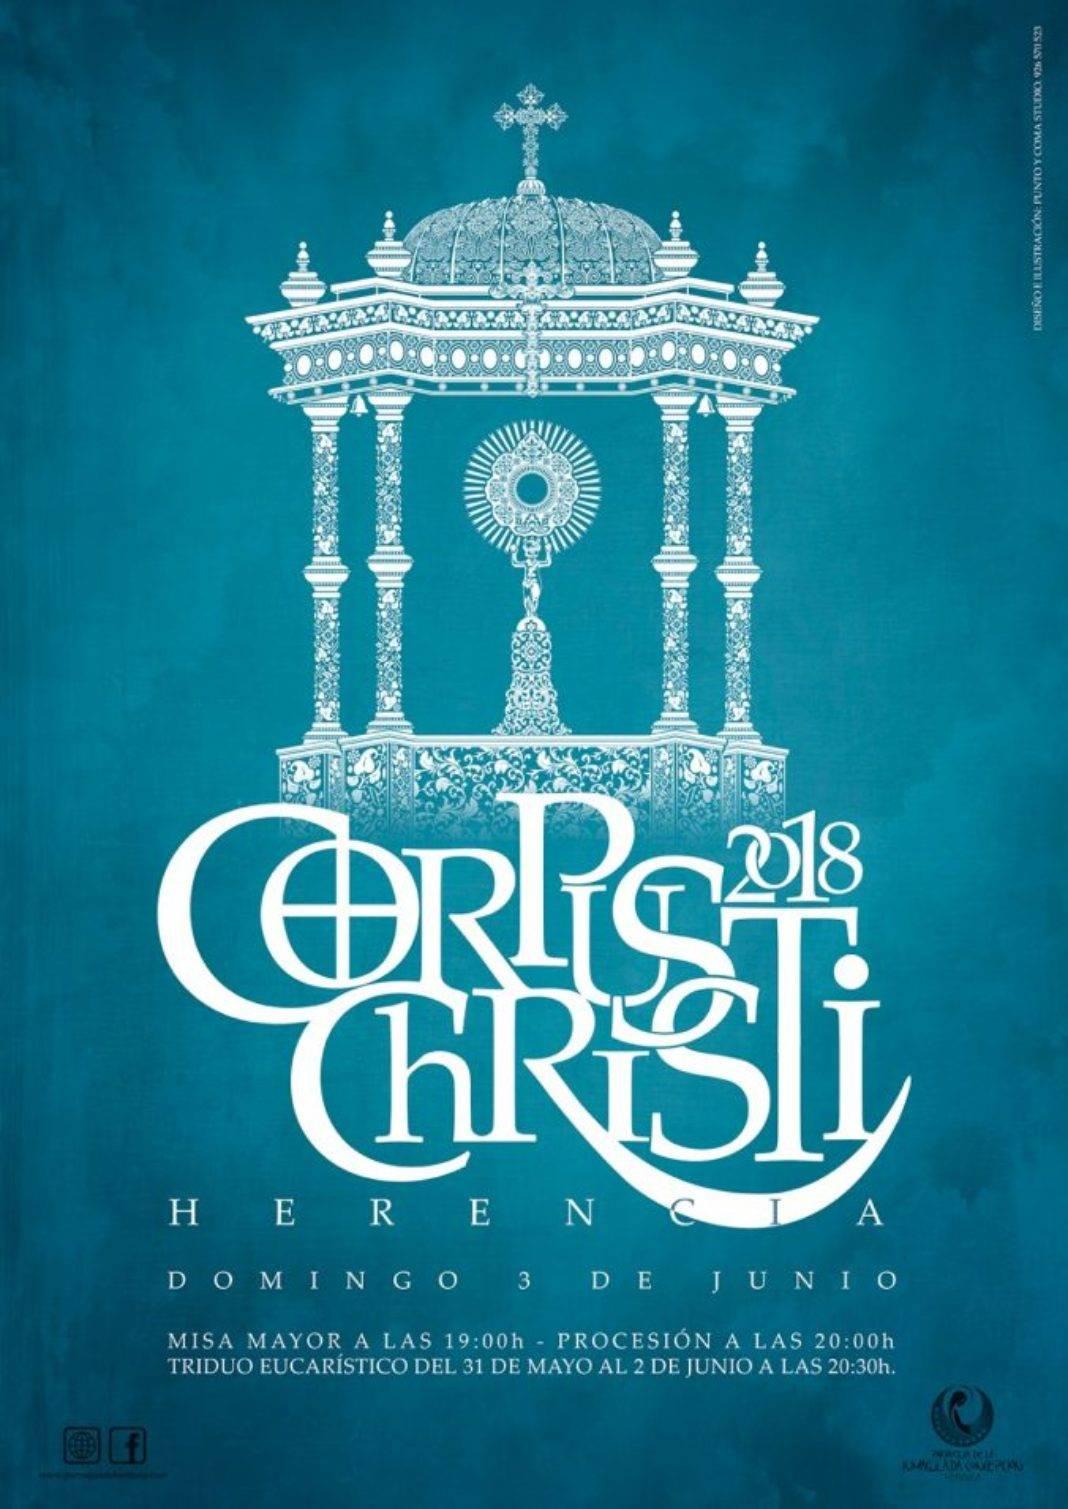 cartel corpus christi herencia 2018 1 1068x1509 - Herencia engalana sus calles para la festividad del Corpus Christi